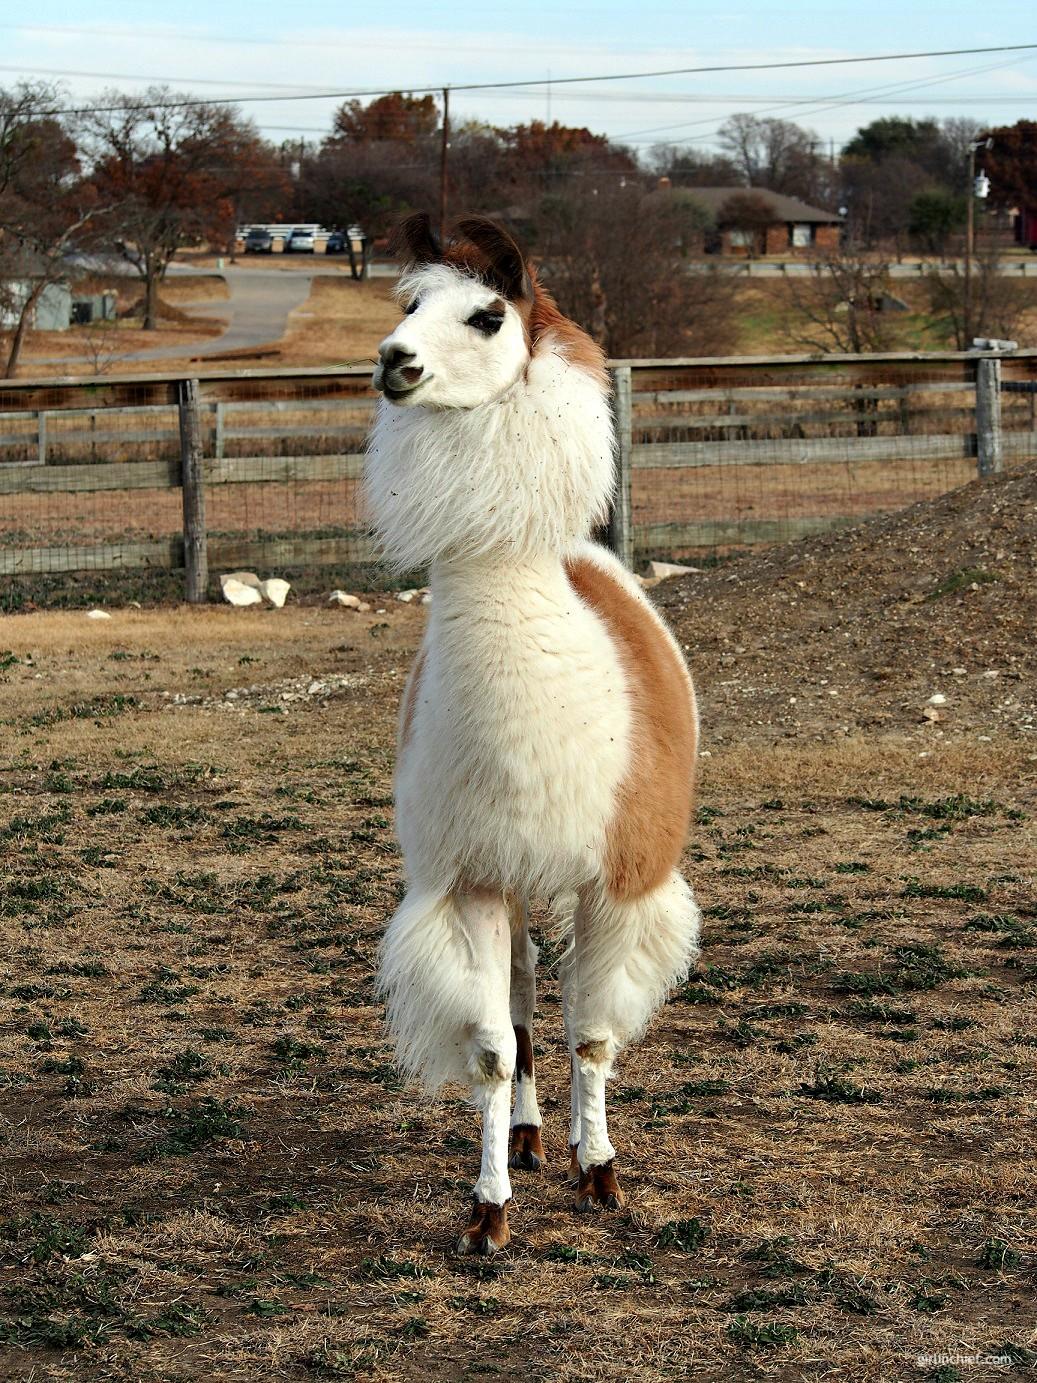 Must-do in Dallas: Llama Lessons at ShangriLlama